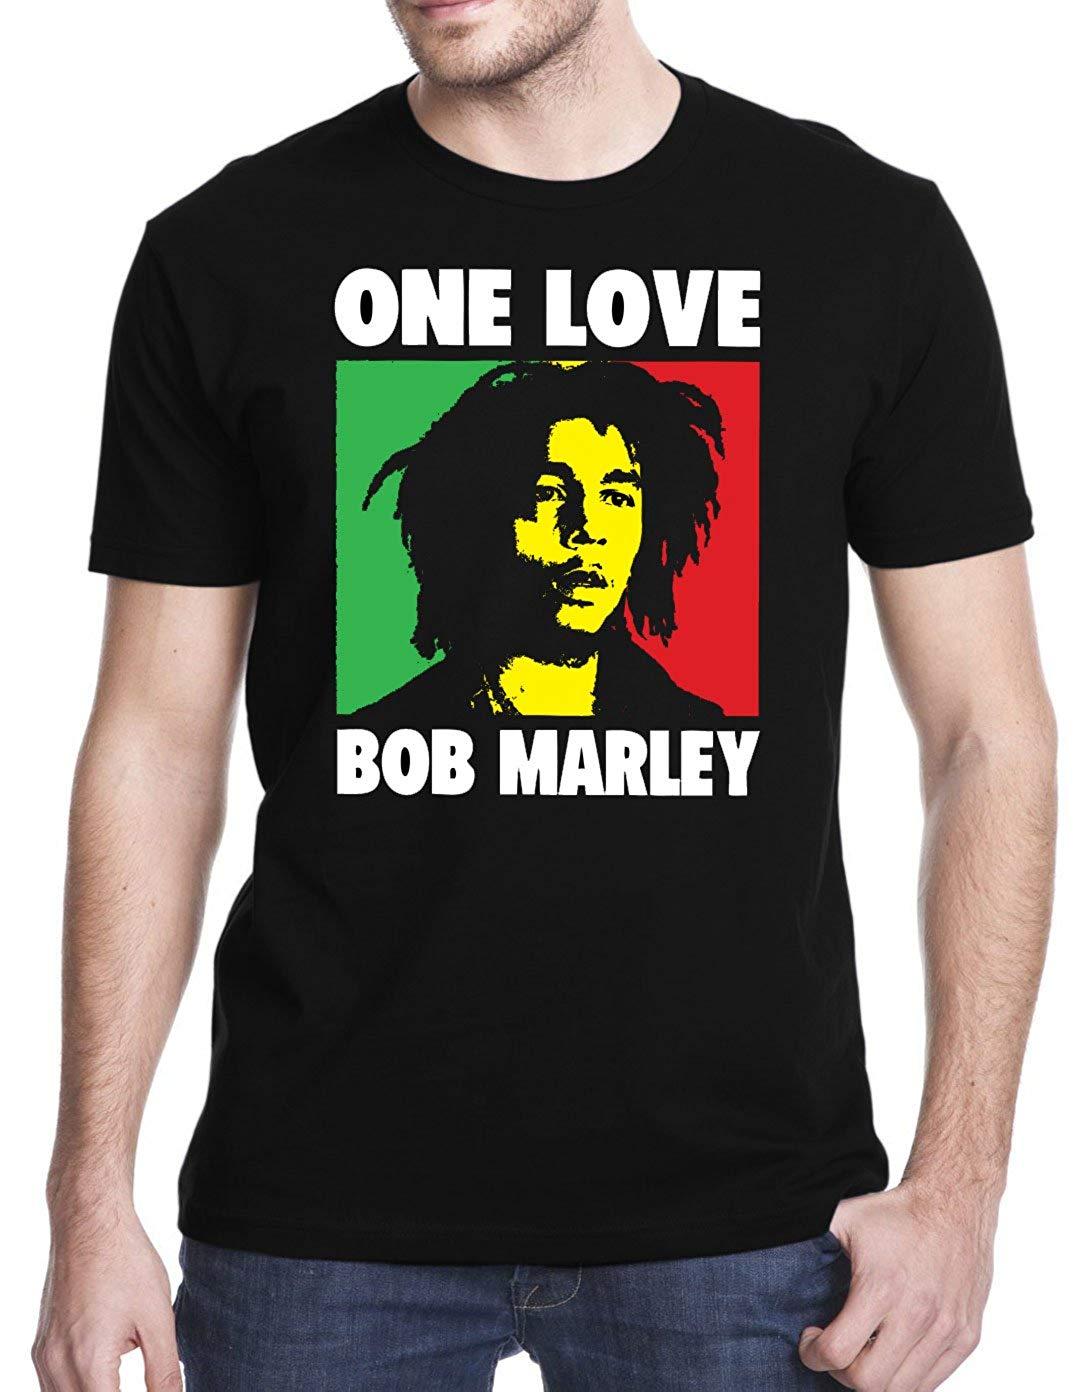 Bob Marley Una Camiseta de algodón de manga corta T camisas de Hombre Ropa de manga corta de descuento de algodón 100% T camisas Camiseta TEE superior